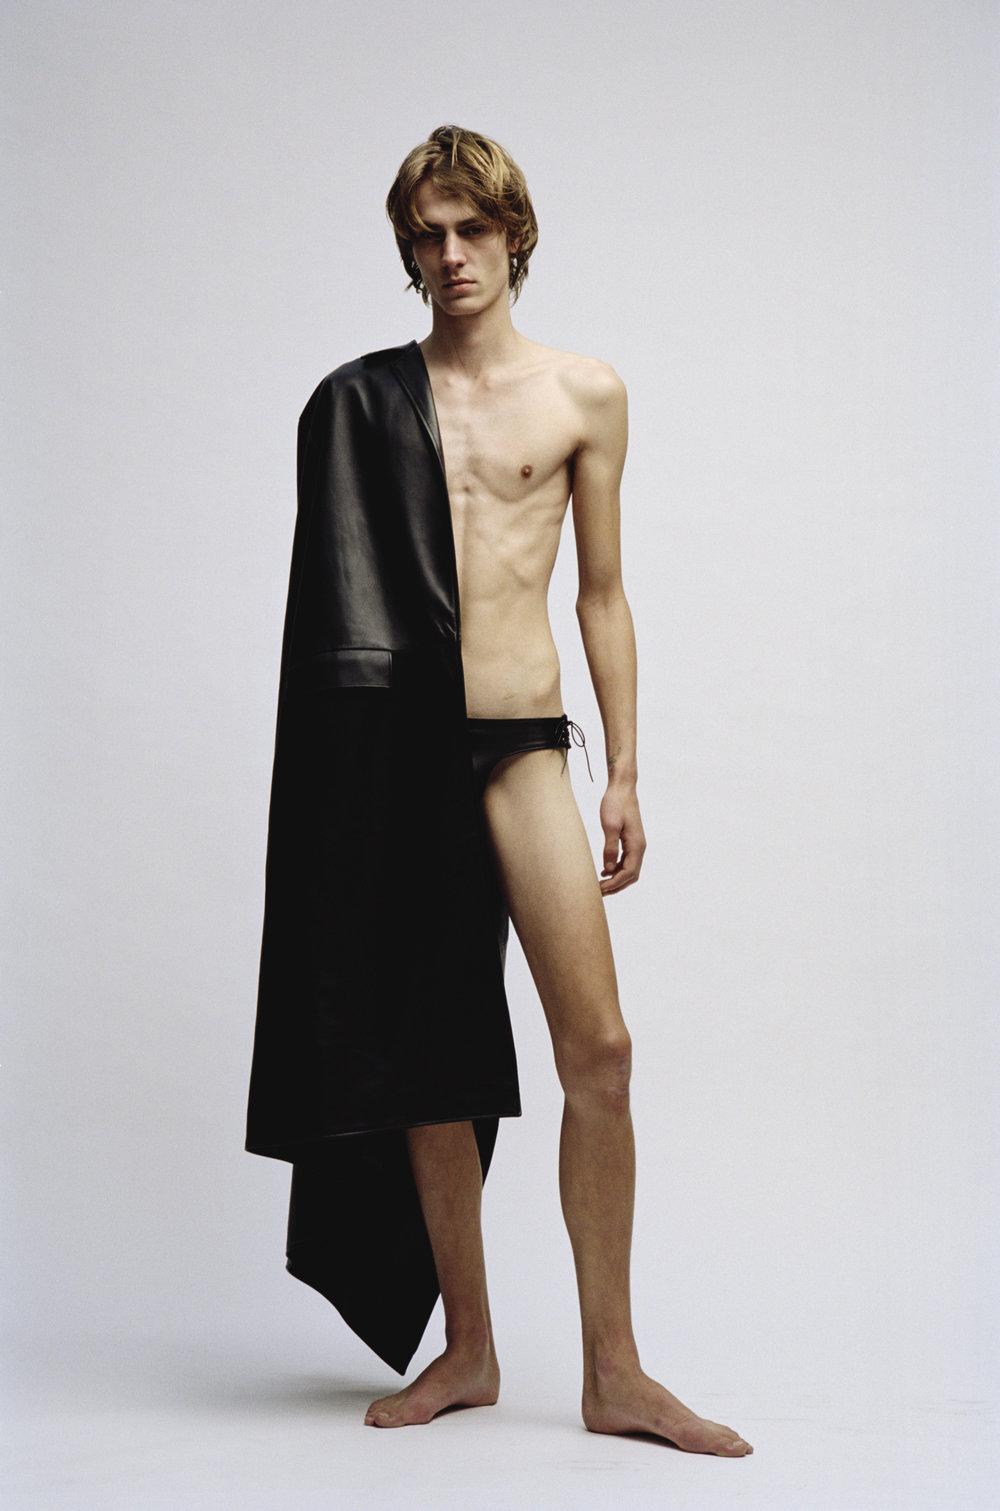 Fabien-Kruszelnicki-Ludovic-de-Saint-Sernin-Ansinth_Page_04_Image_0001.jpg